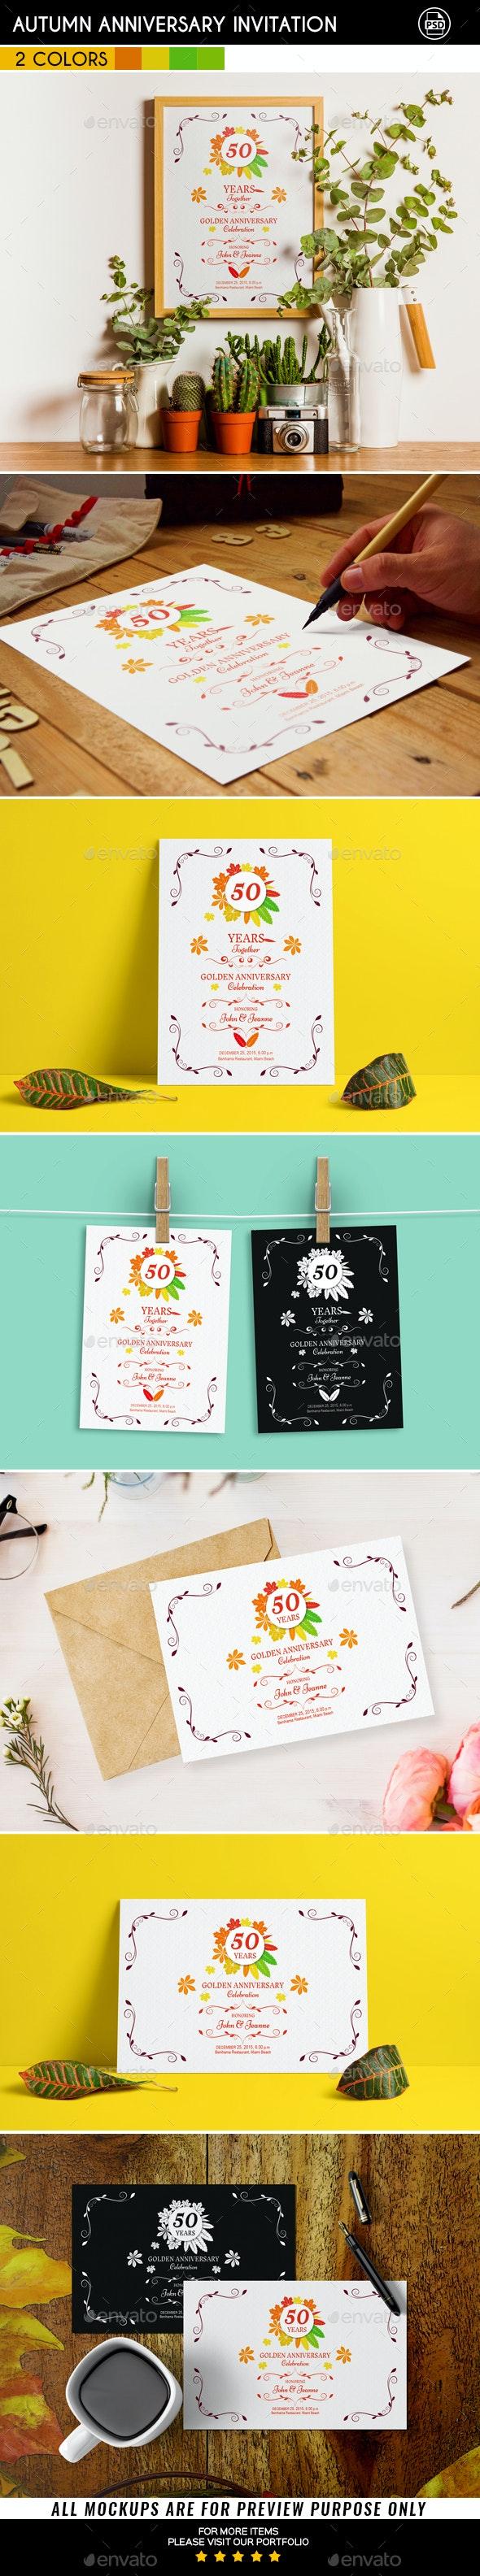 Autumn Anniversary Invitation - Anniversary Greeting Cards